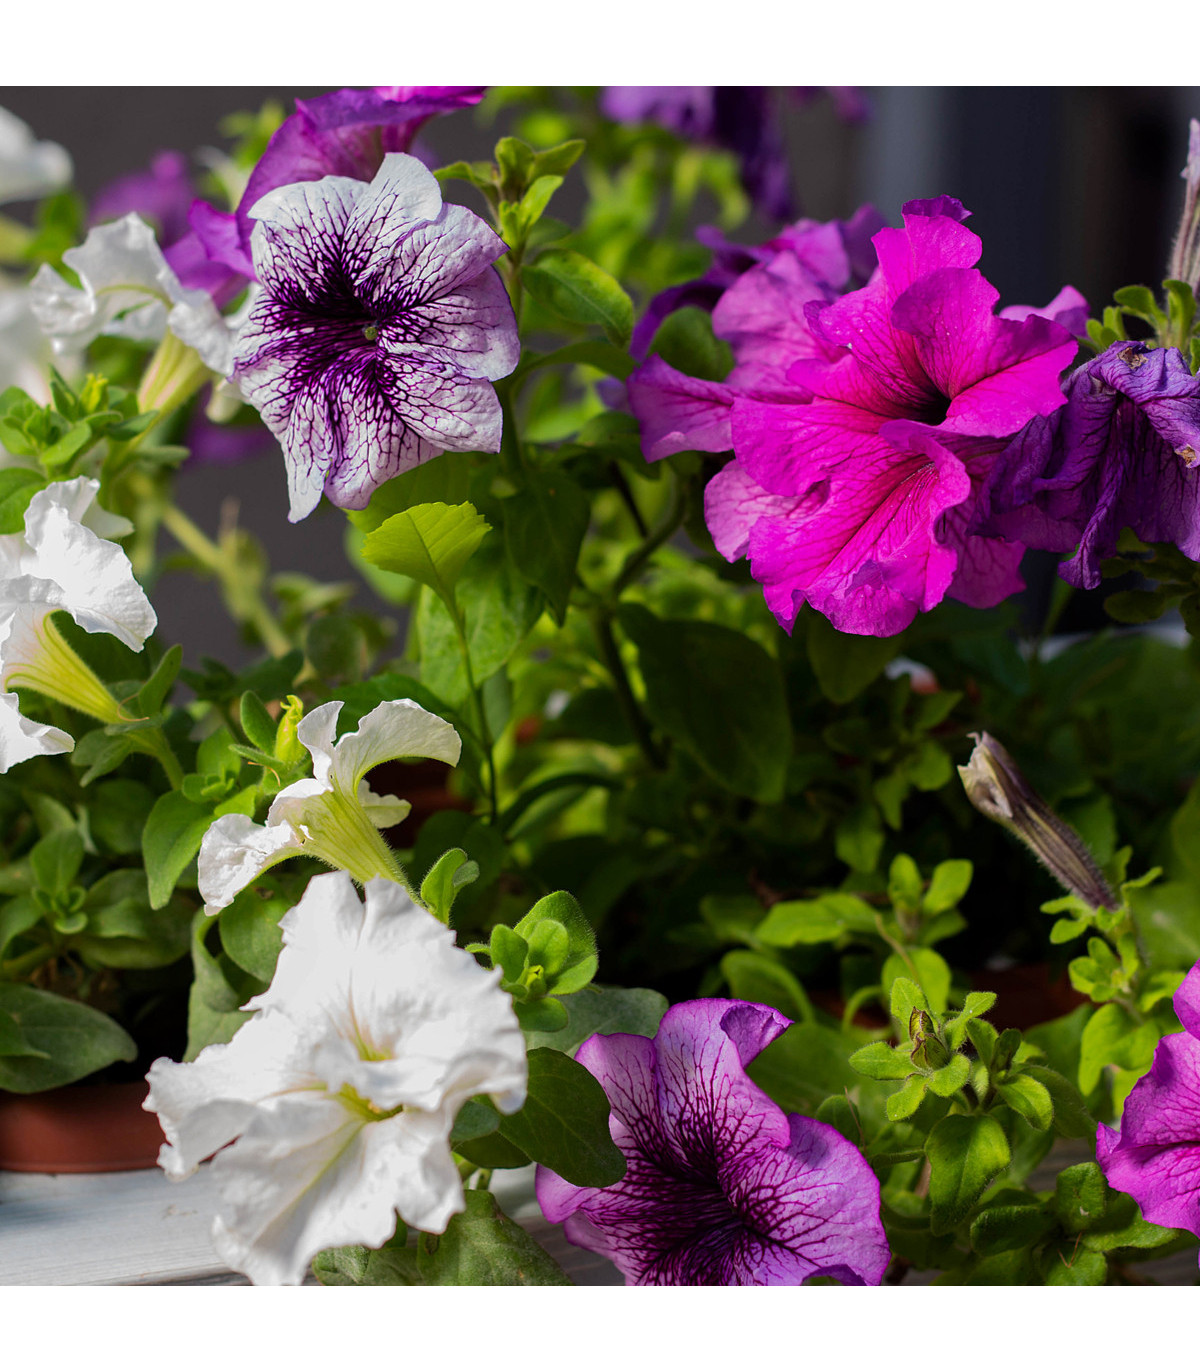 Petúnie velkokvětá převislá - semena Petúnie - Petunia hybrida pendula - 20 ks